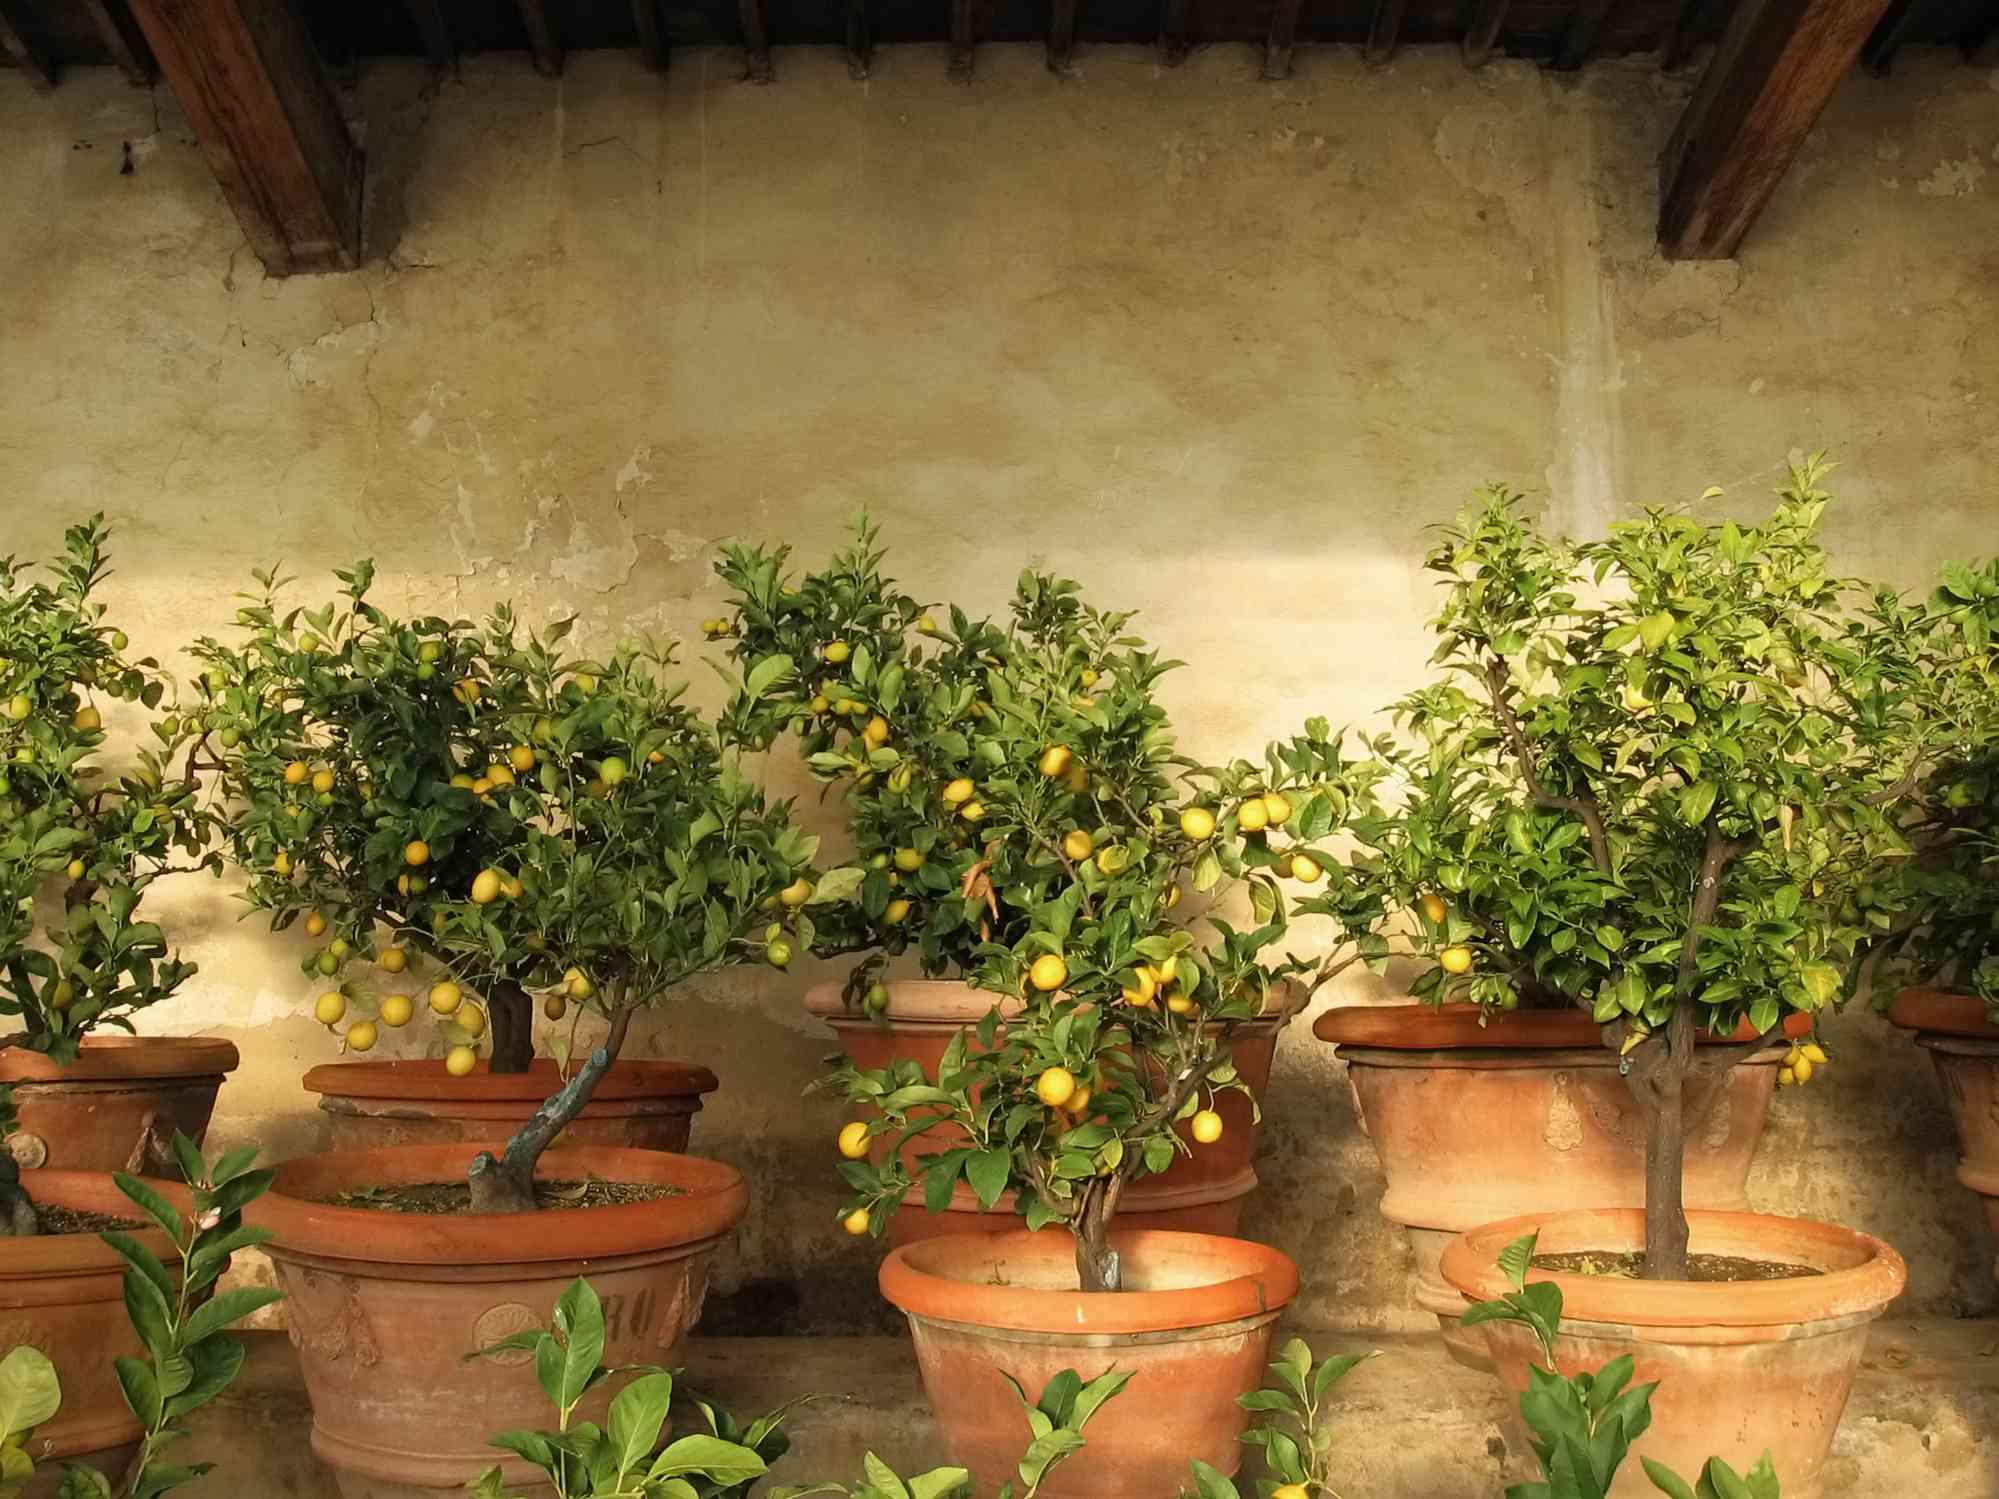 Lemon trees inside rustic lemon tree greenhouse in Tuscany, Italy